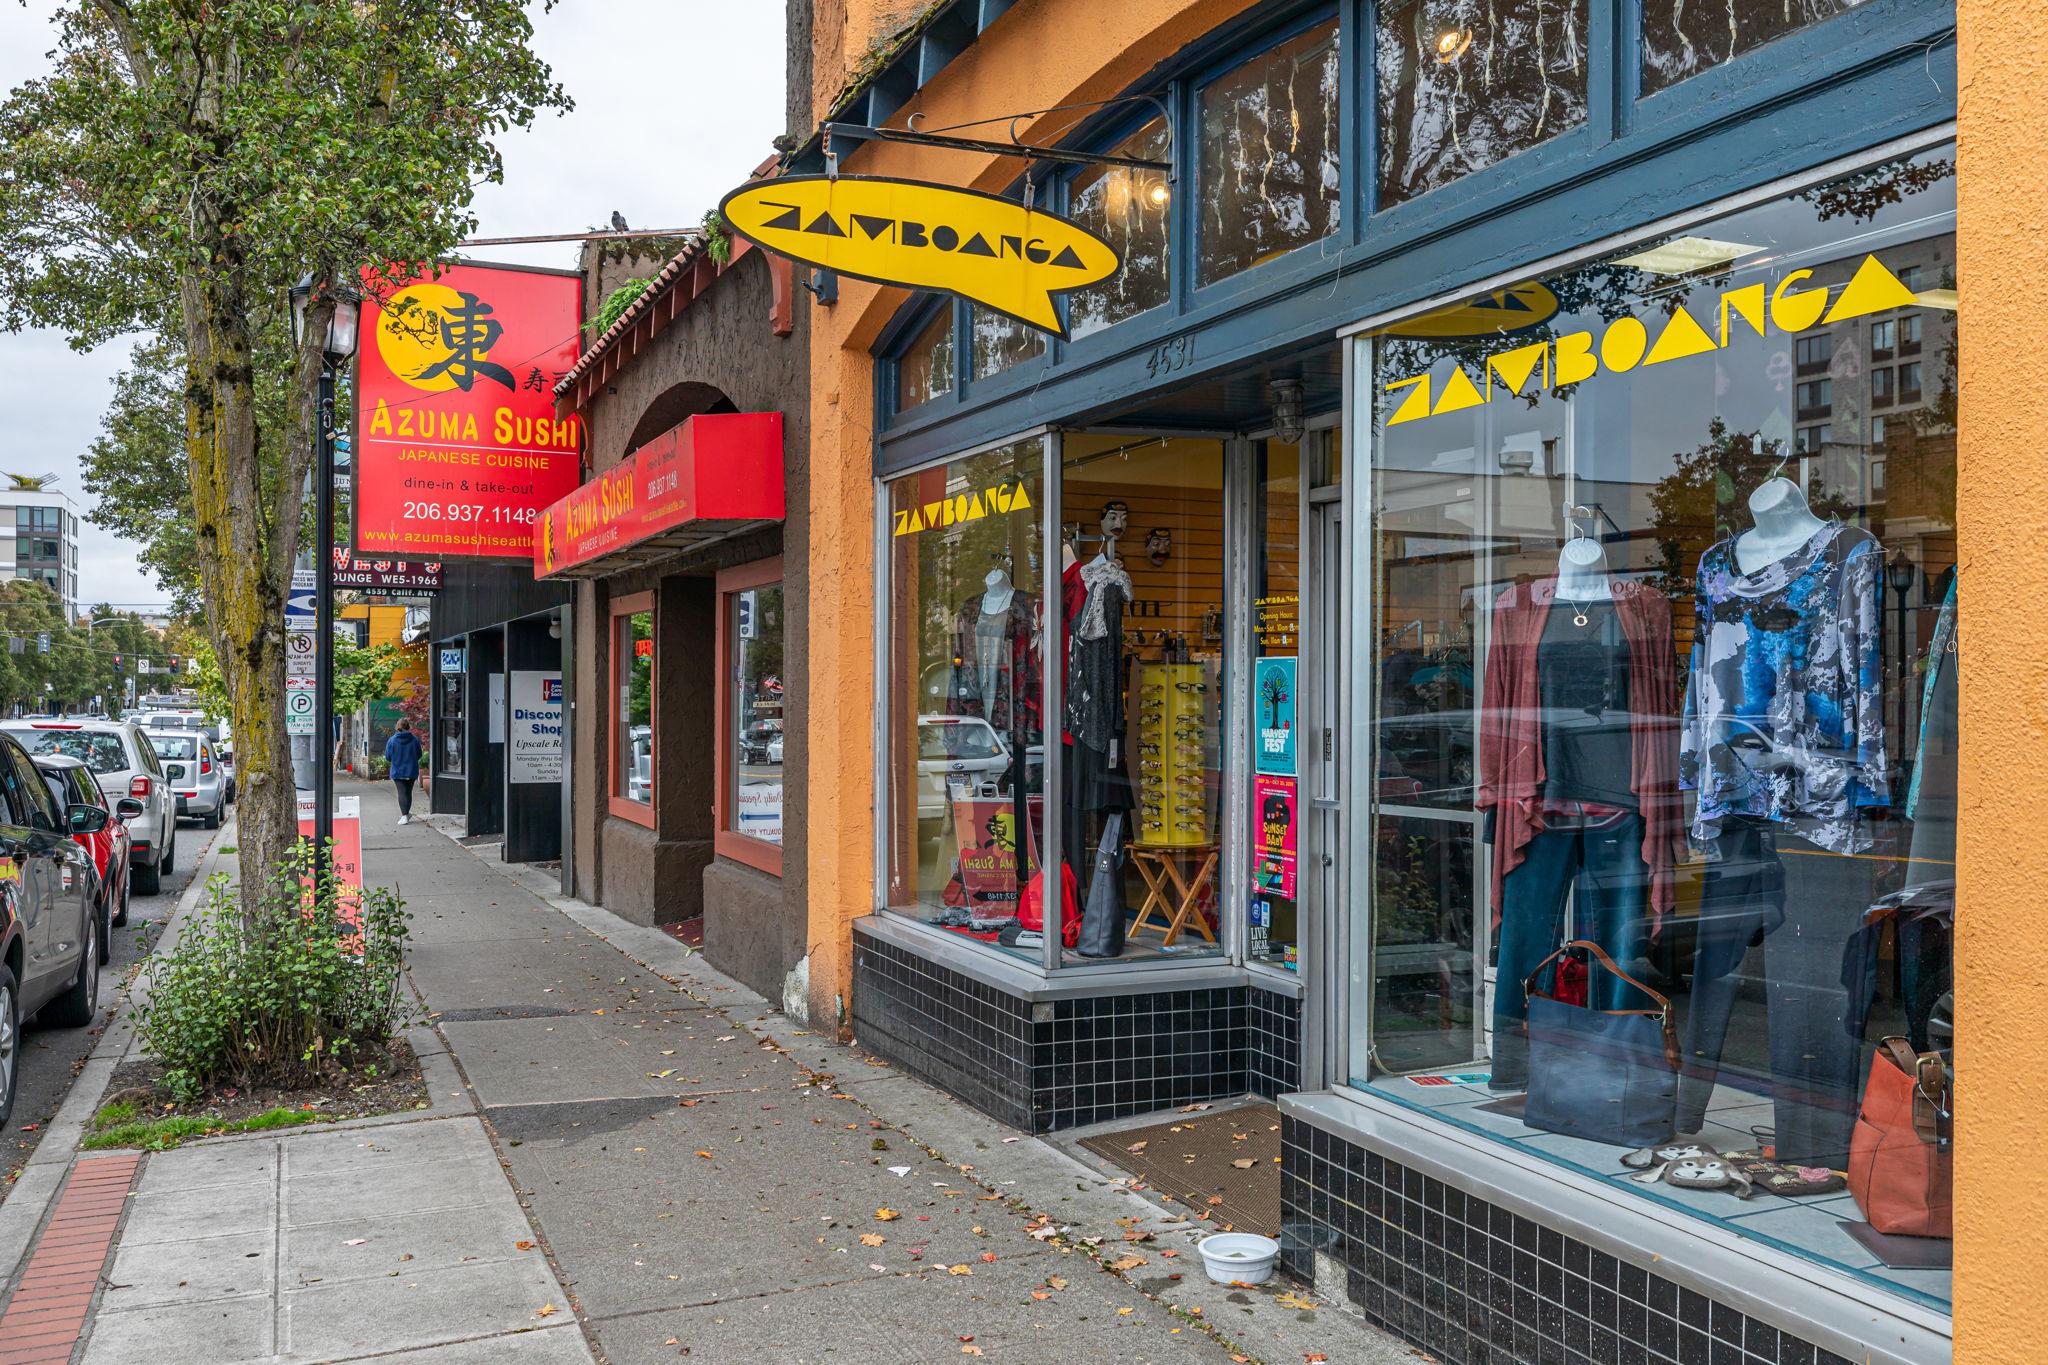 Shopping on California Street 1 block away